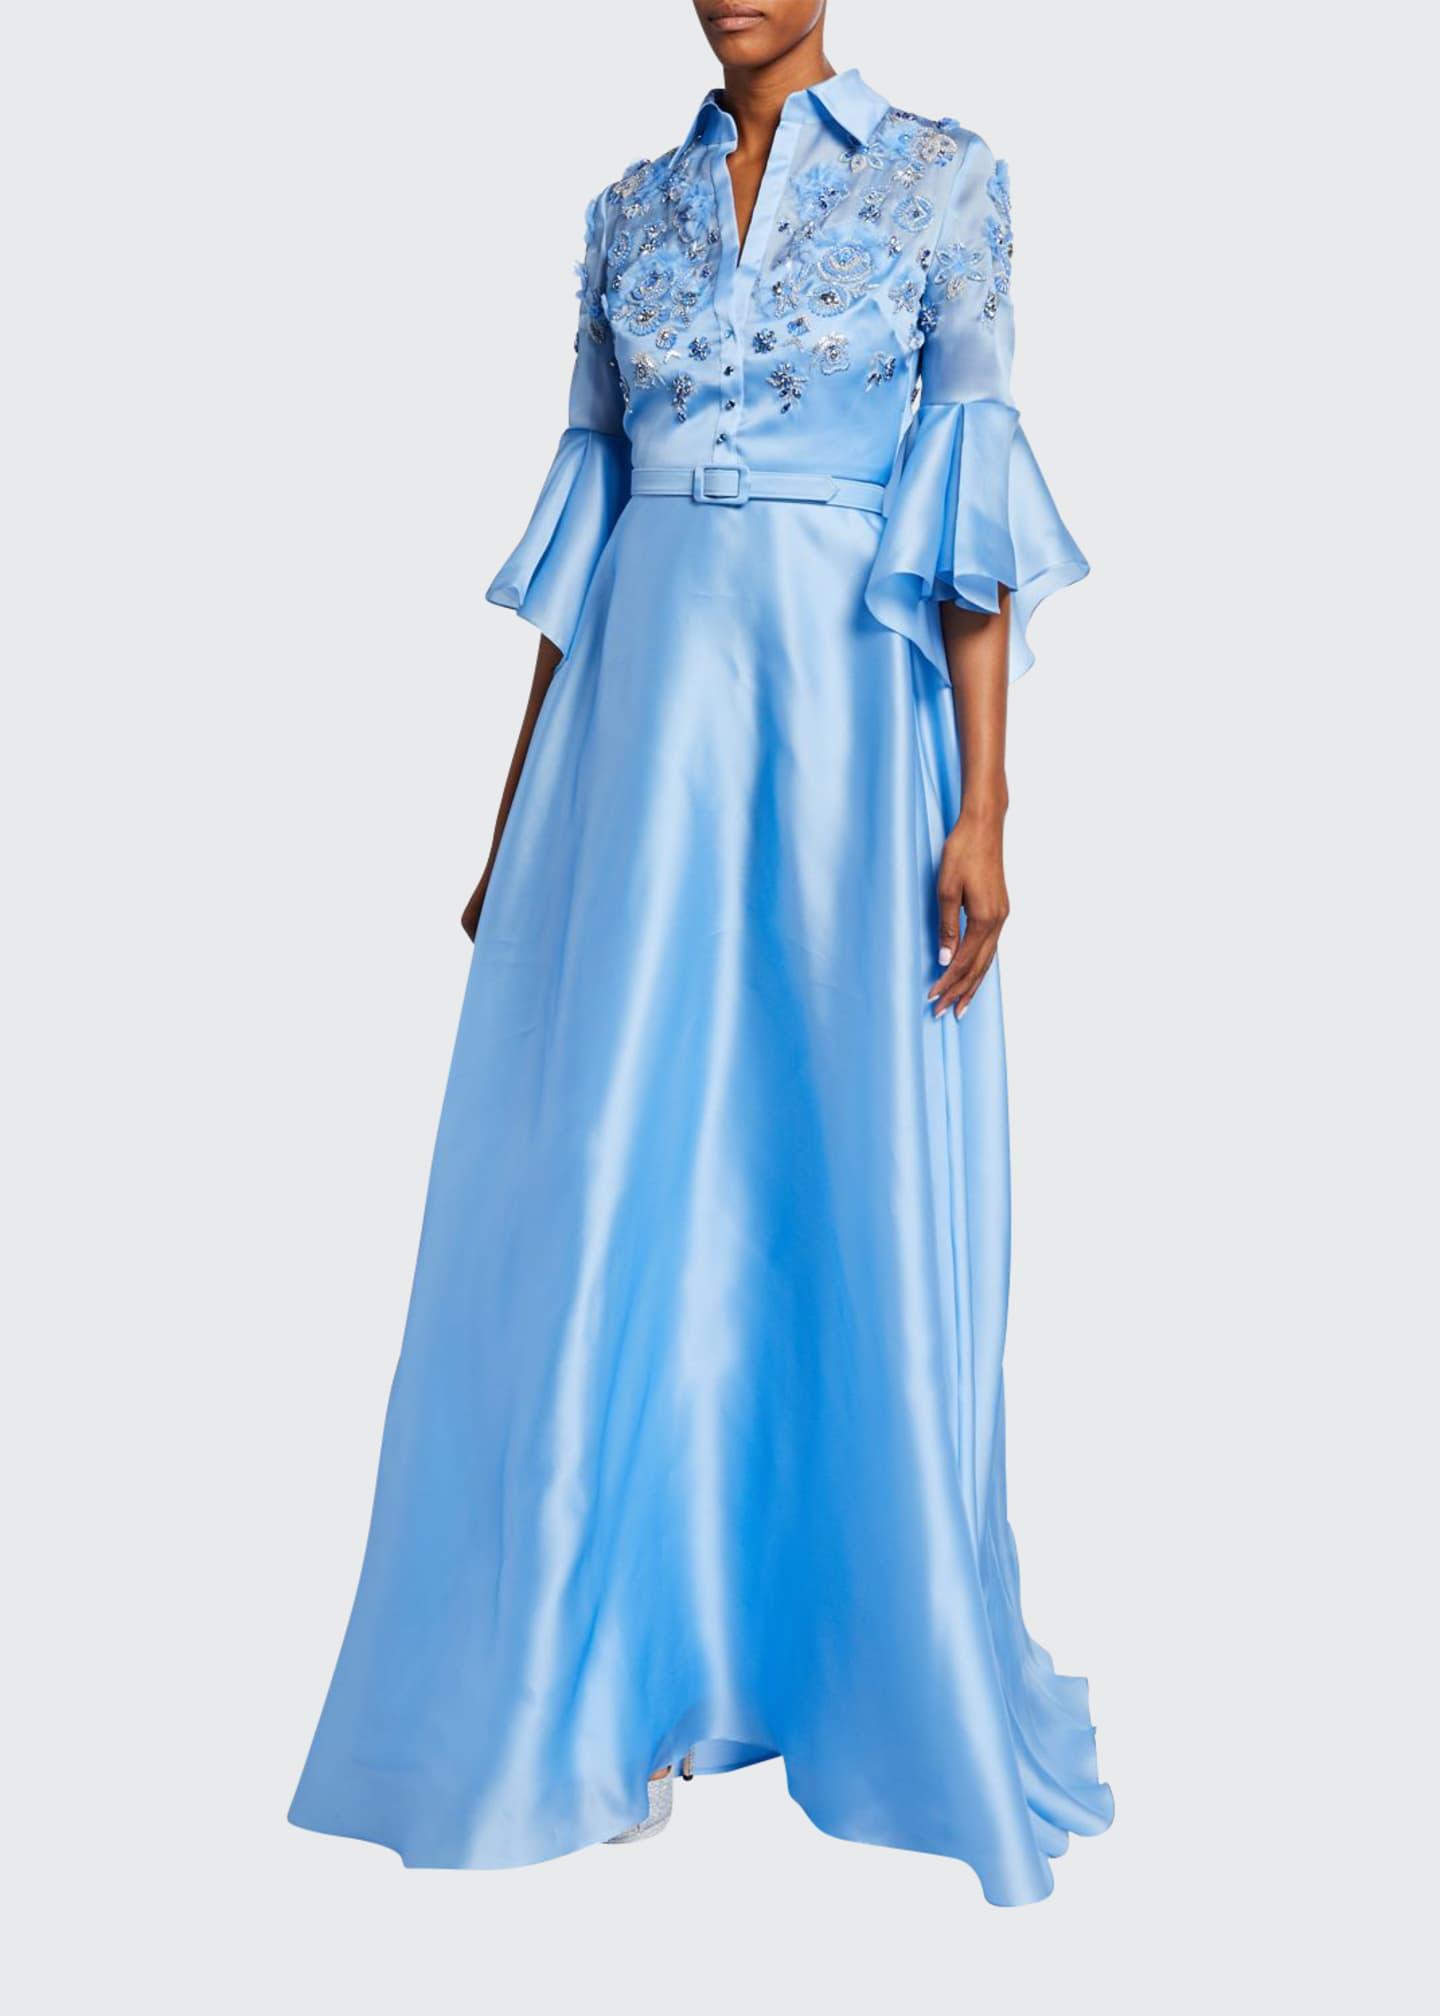 Badgley Mischka Couture Embellished Silk Shirtdress